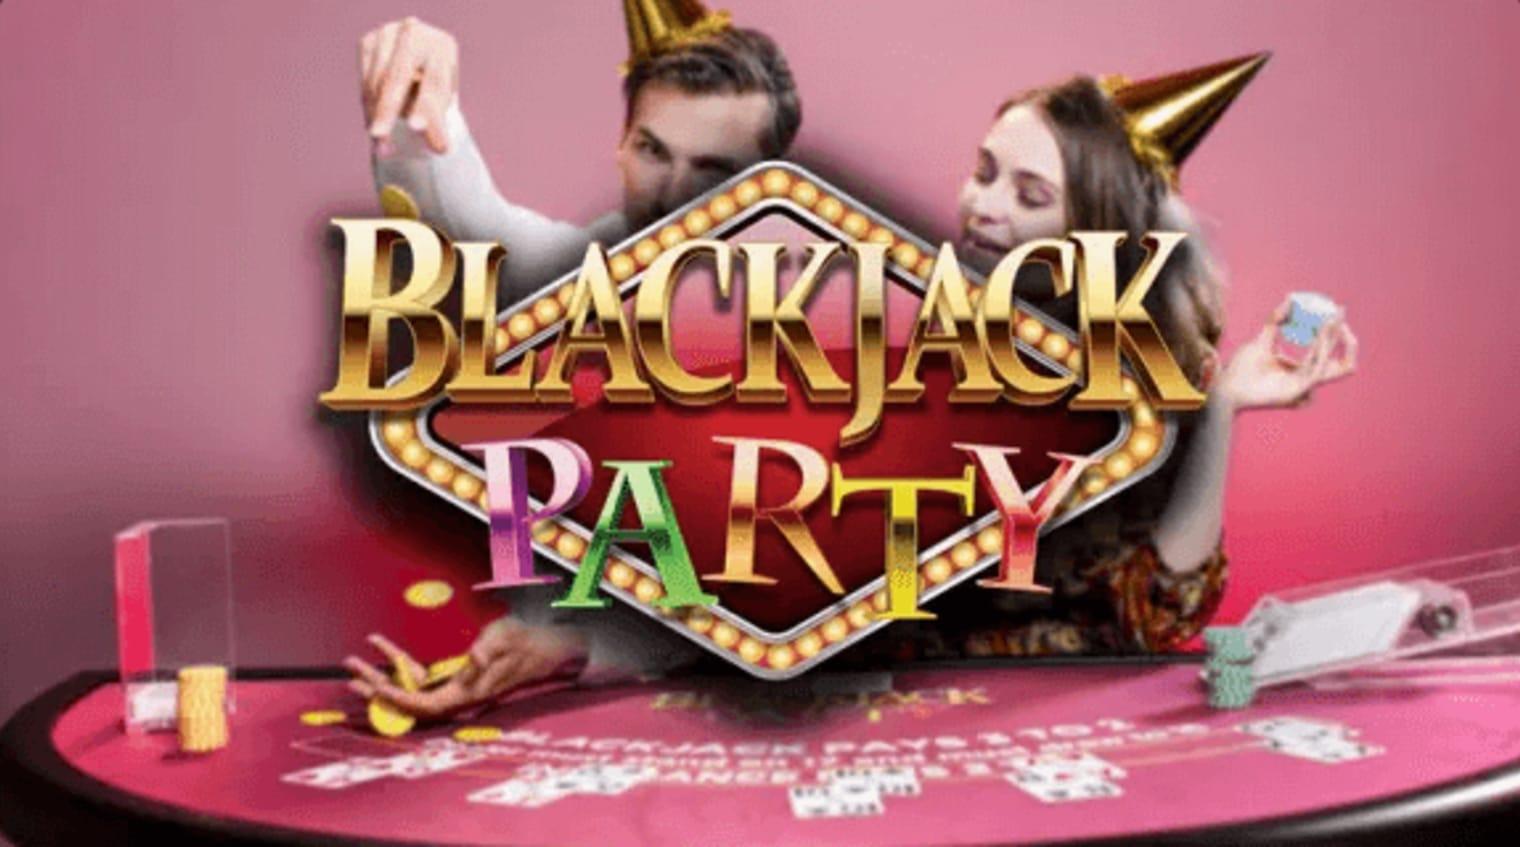 Blackjack Party